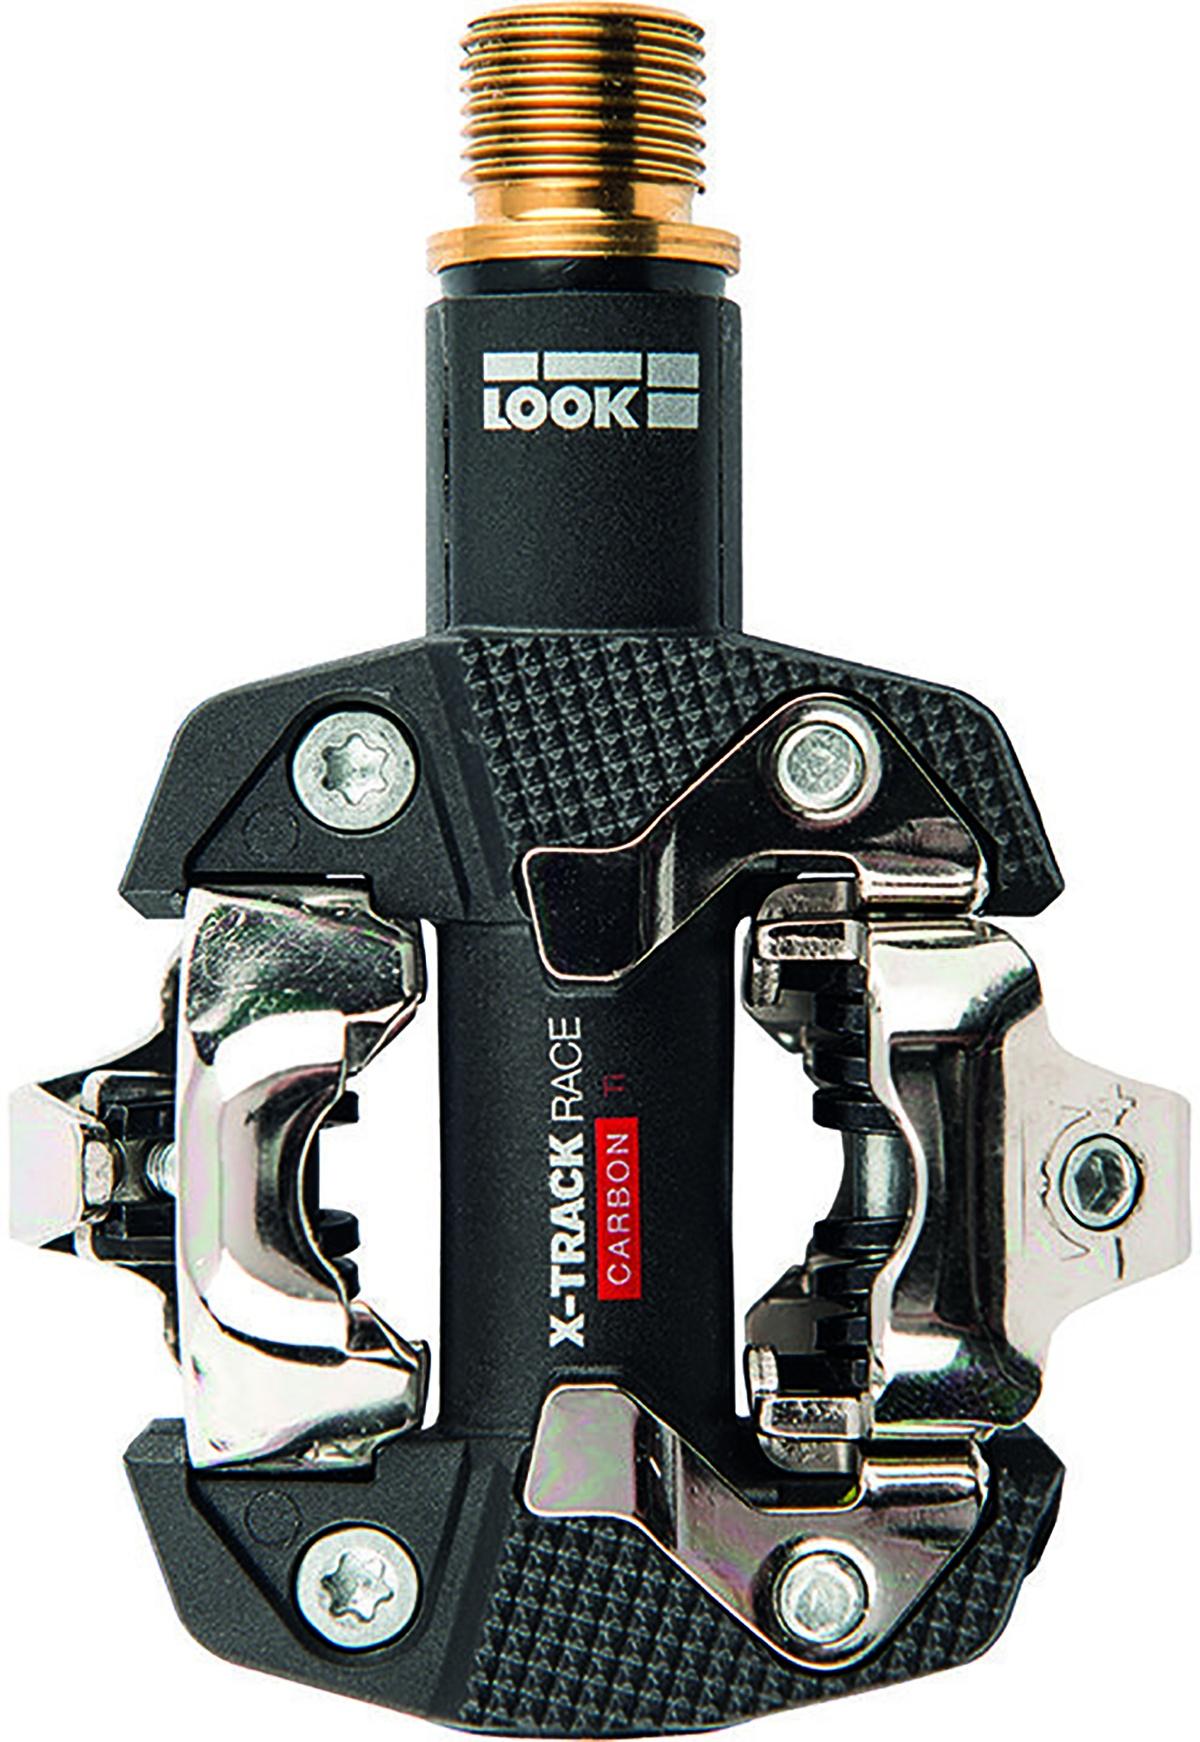 LOOK Pedal X-Track Race Carbon Ti - Black